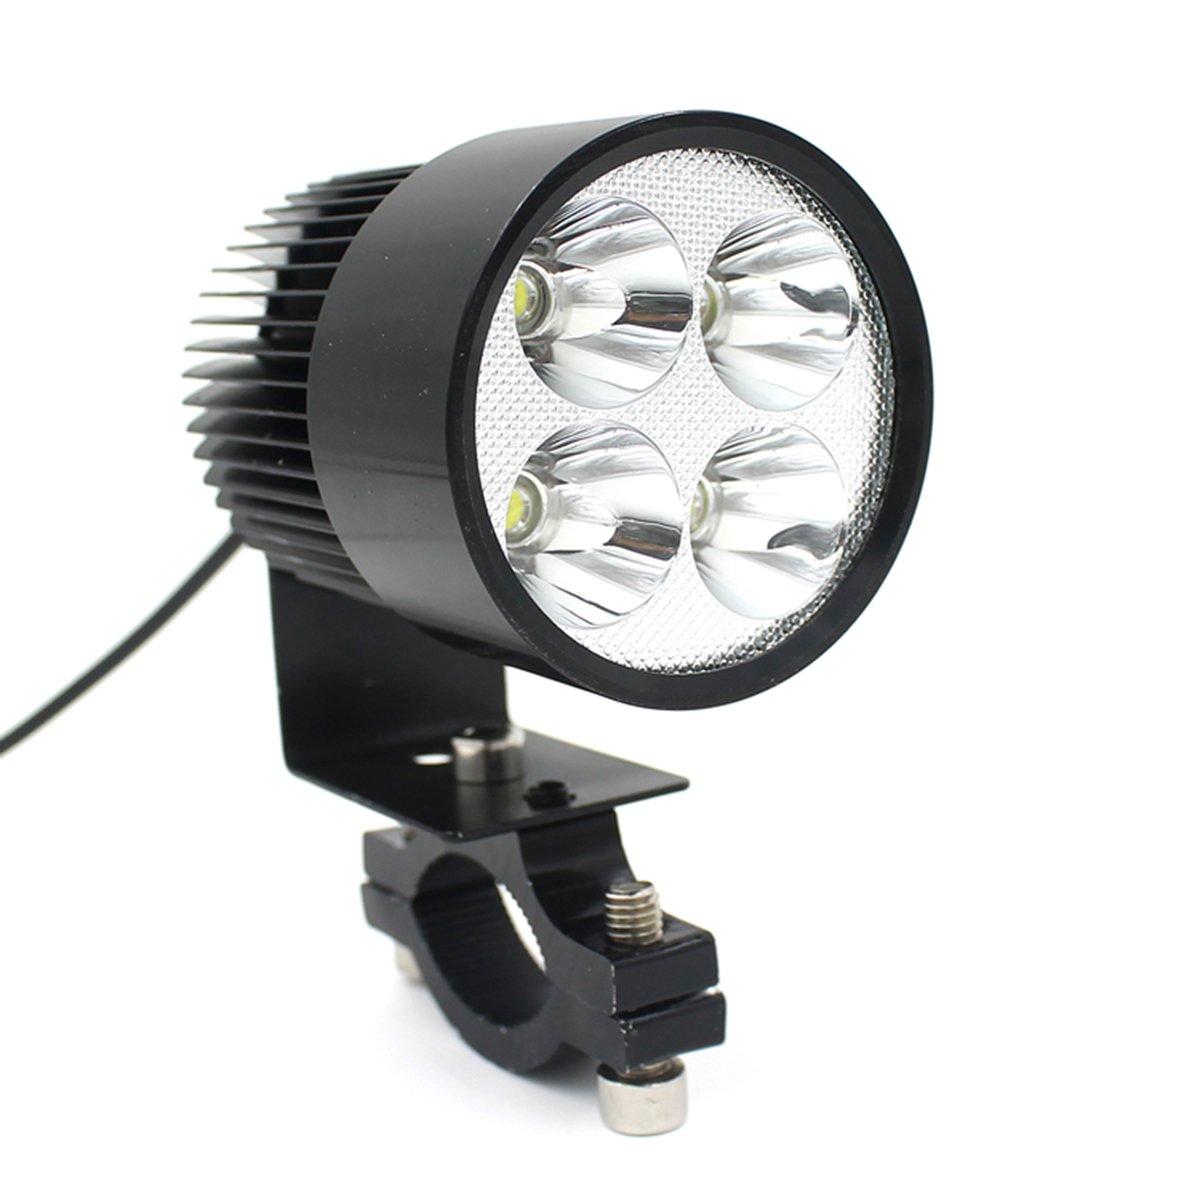 LEORX 12V-80V 20W Motorcycle E-bike LED Headlight Lamp Car Accessories (Black) 4336326743